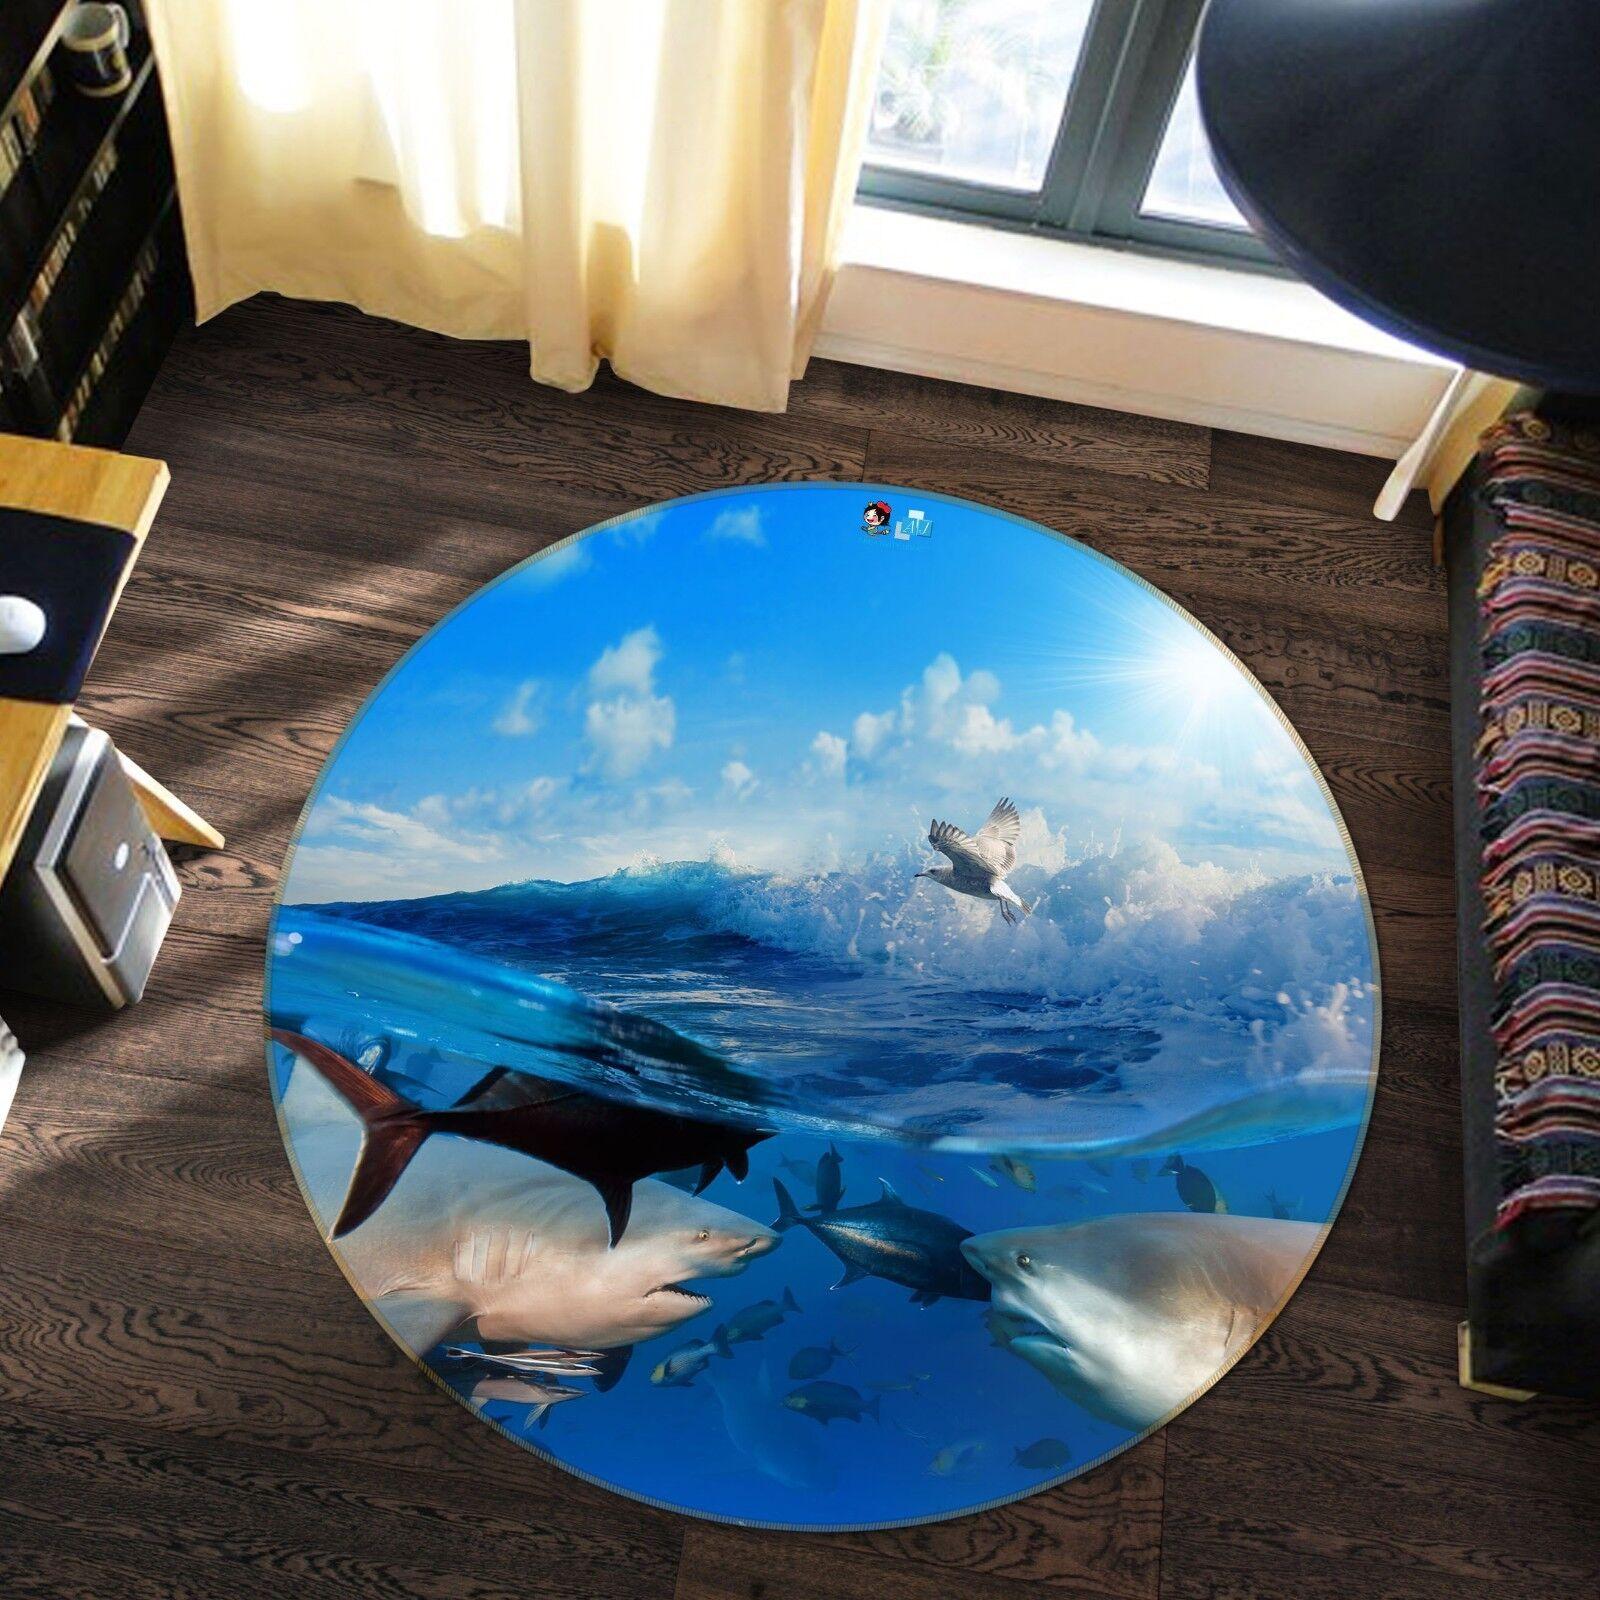 3D Delfino Oceano 11 Pavimento Antiscivolo Tappeti Elegante Tappeto IT Carly